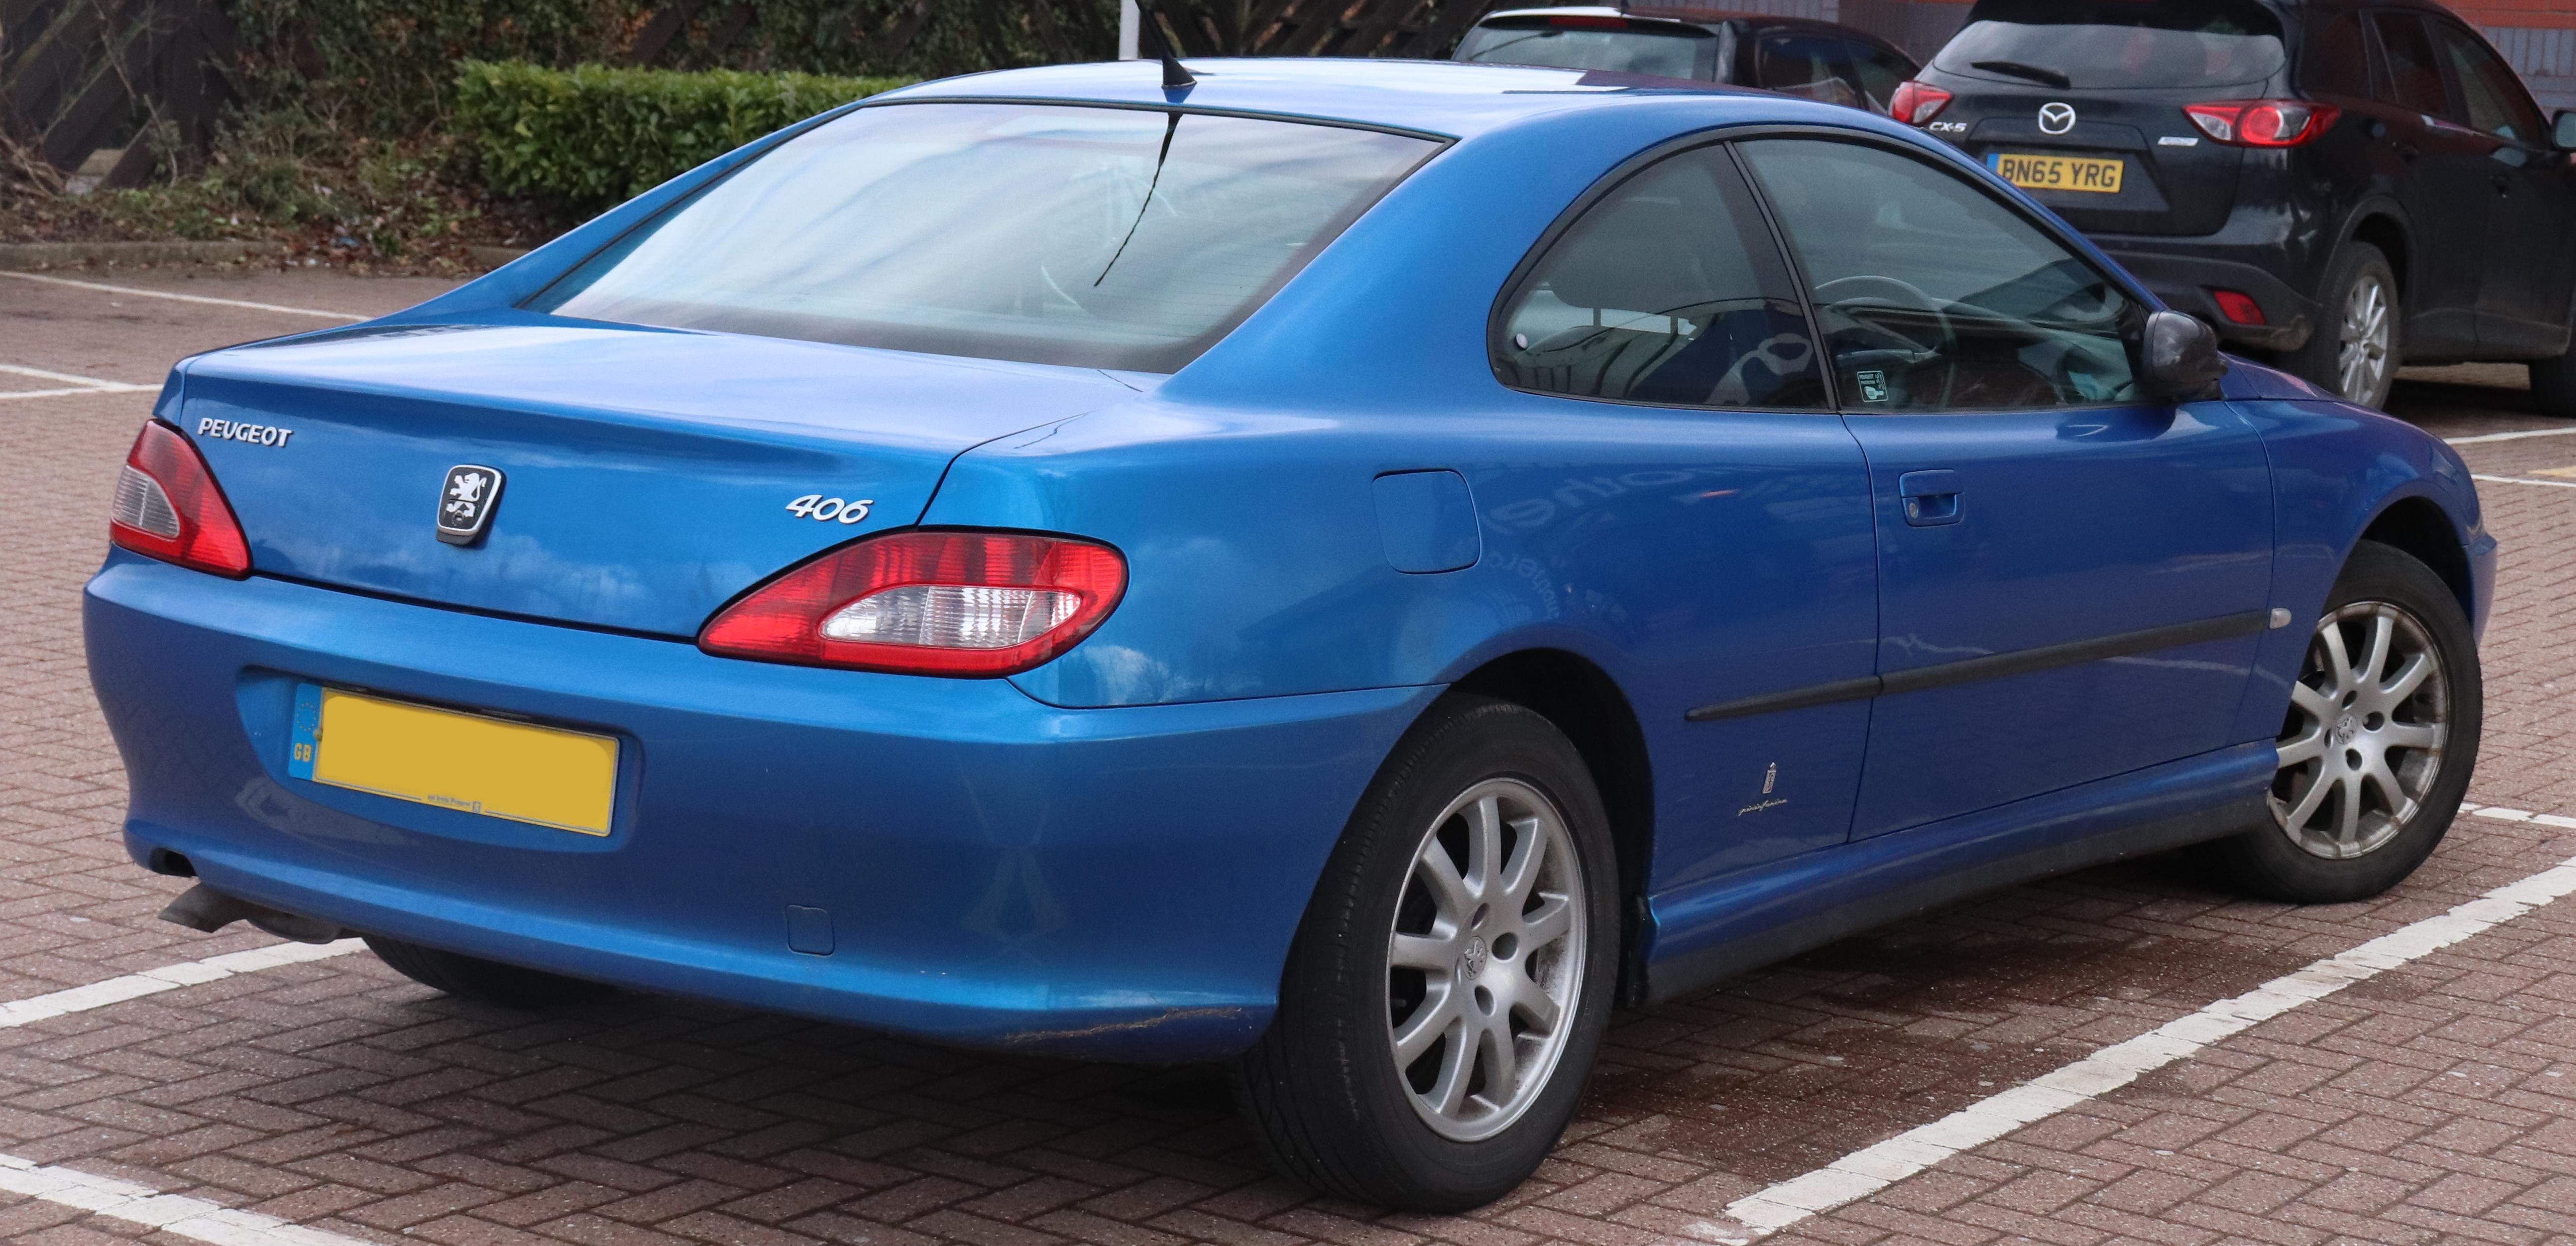 Ficheiro 2003 Peugeot 406 Hdi Coupe Se 2 2 Rear Jpg Wikipedia A Enciclopedia Livre